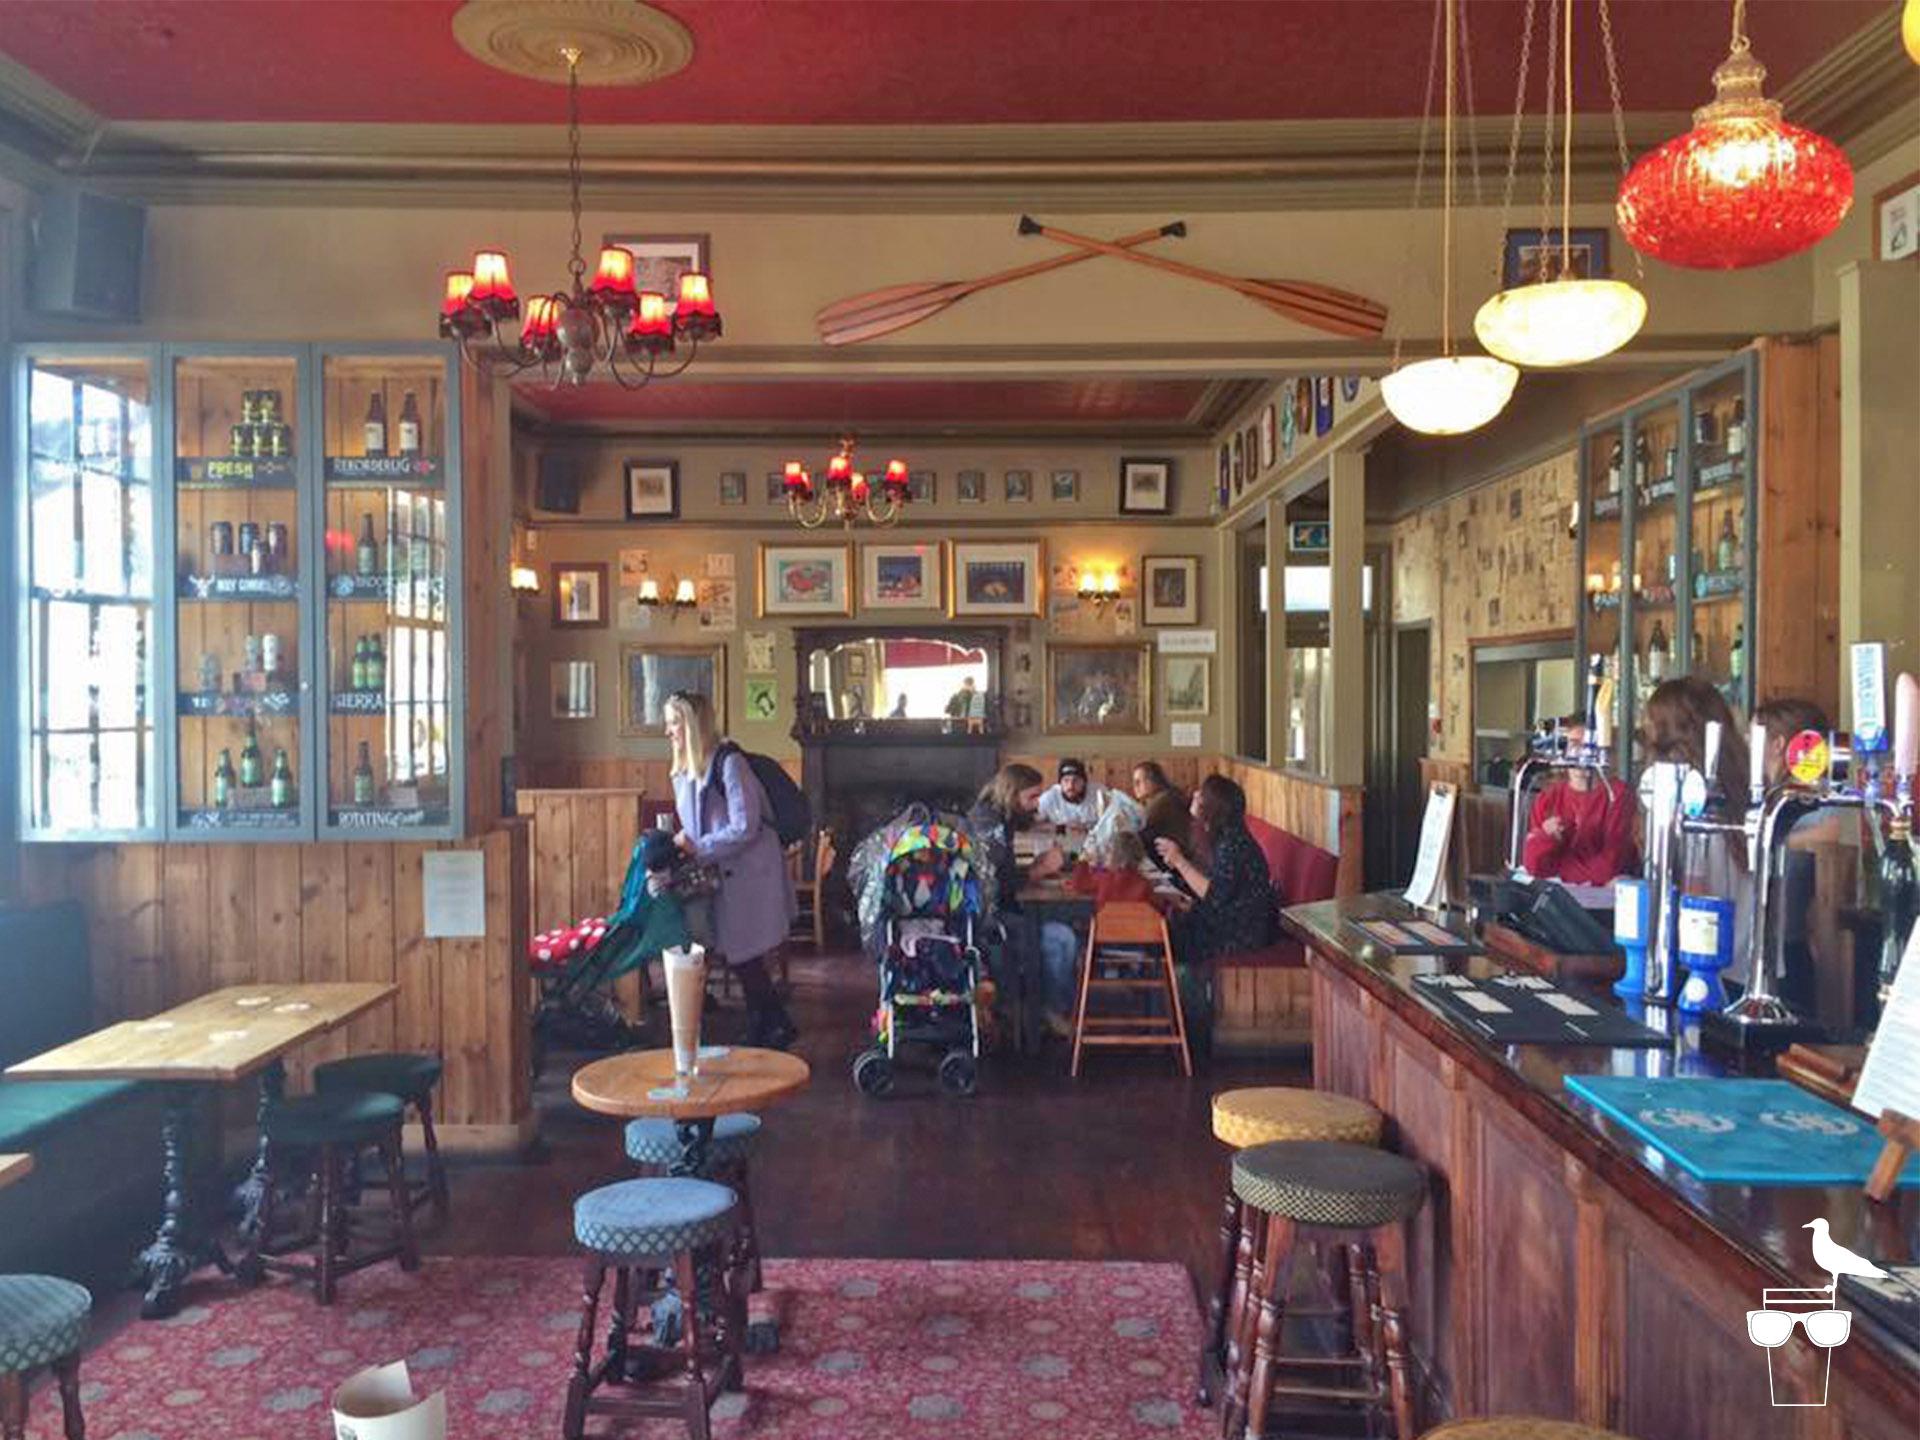 preston park tavern brighton inside bar area